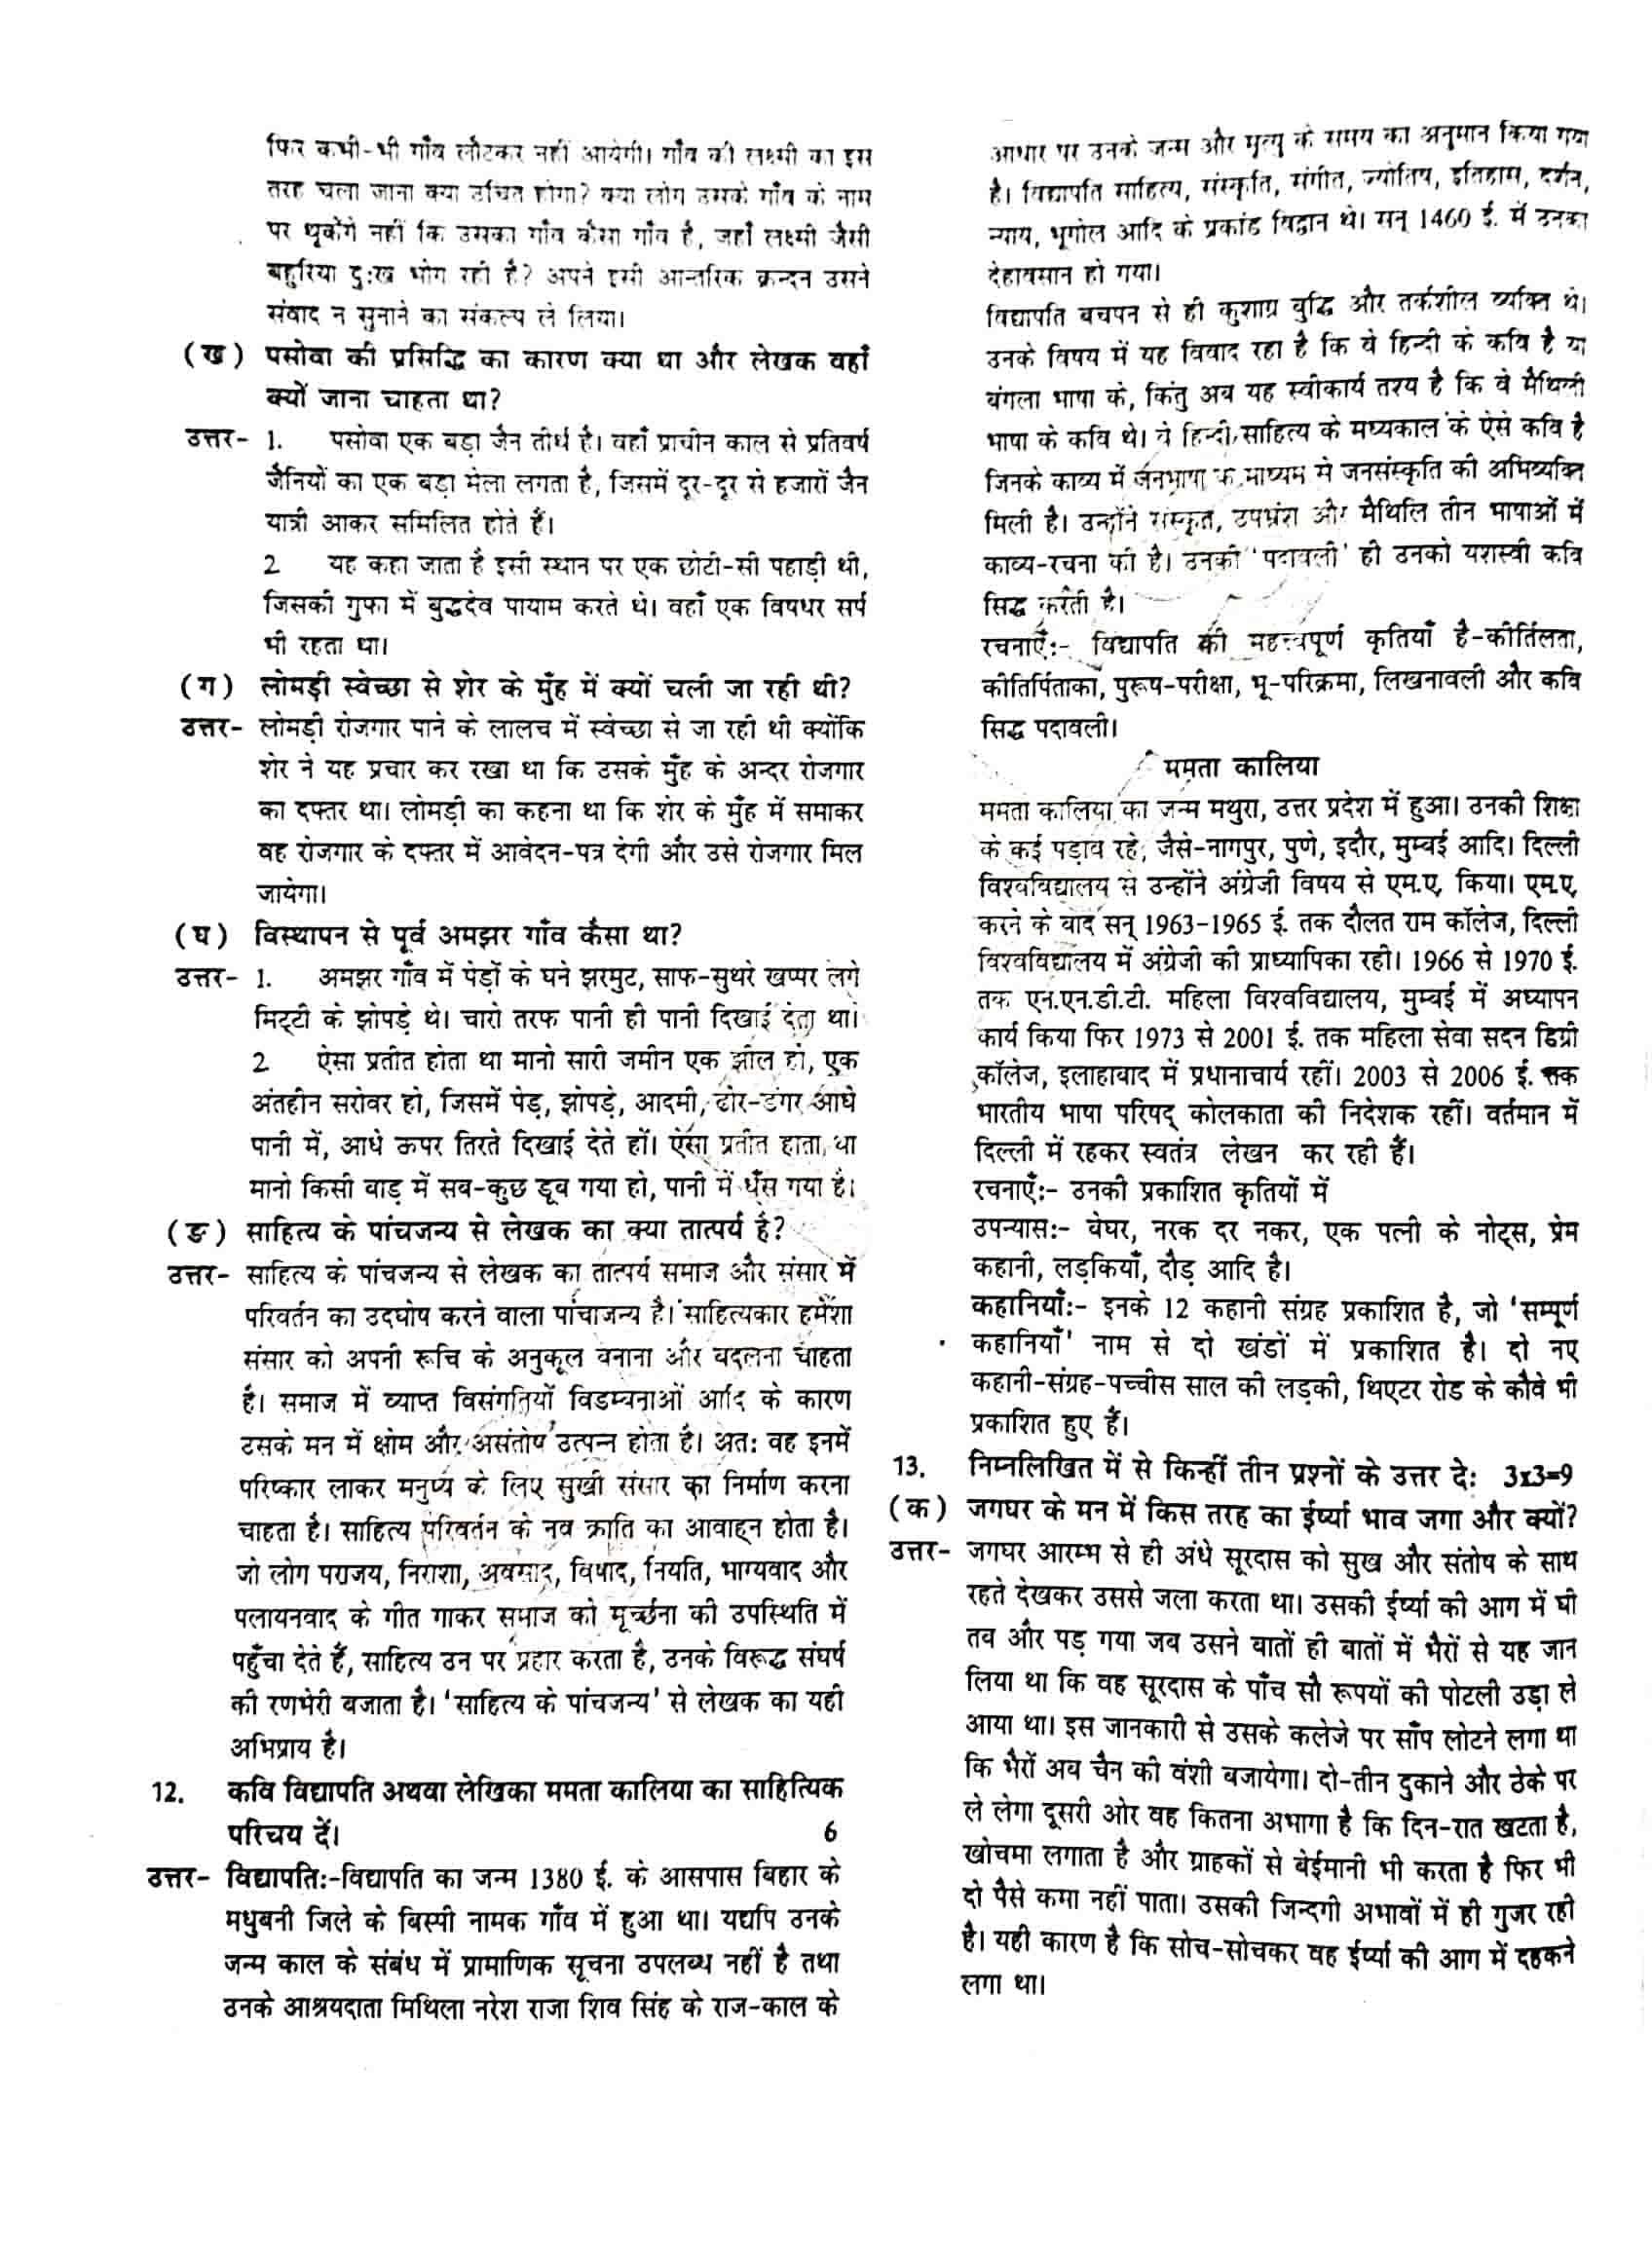 JAC Class 12 hindi 2020 Question Paper 04